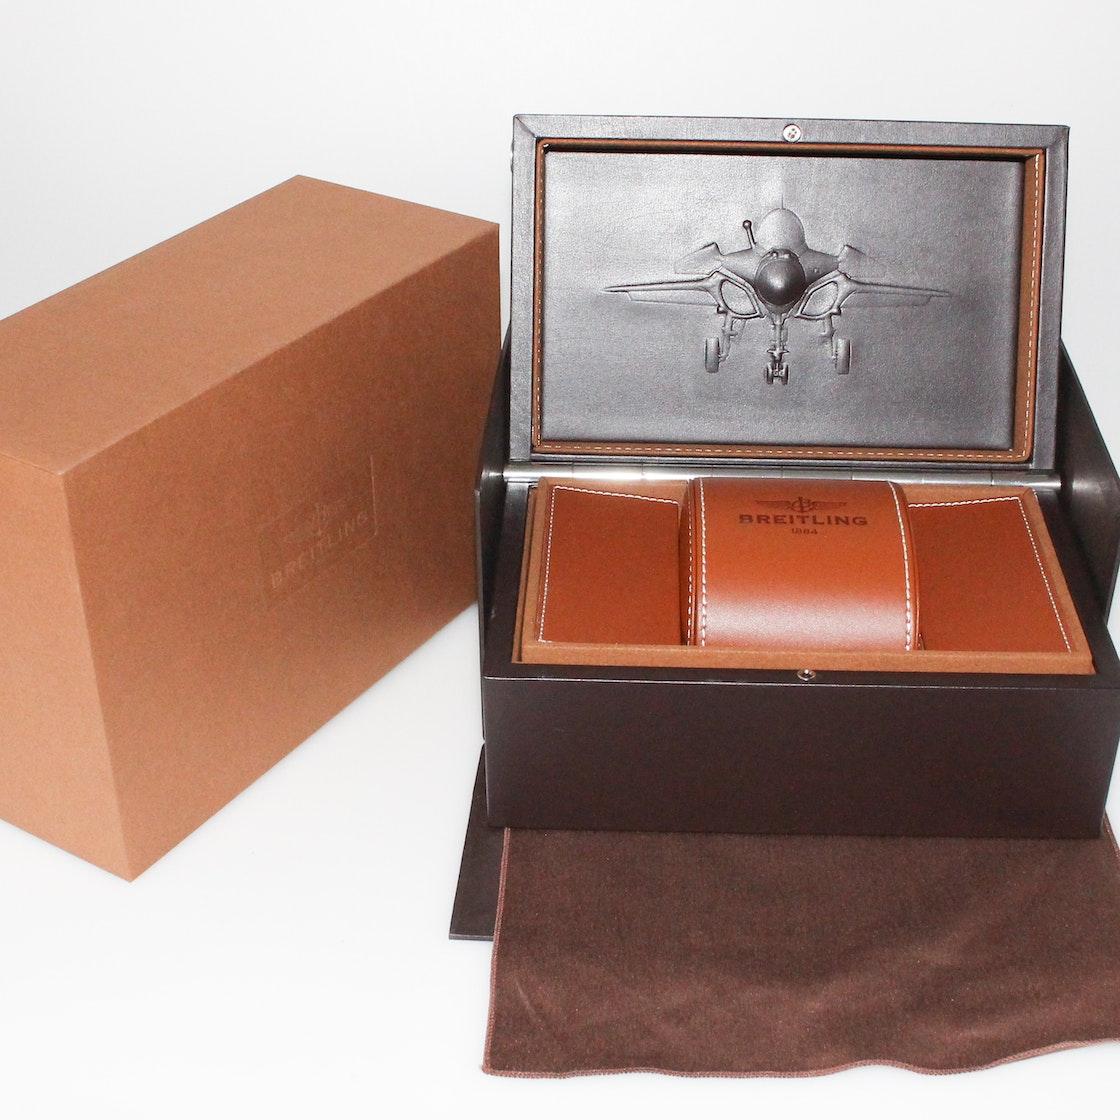 Breitling Transocean Chronograph RB015212/BB16